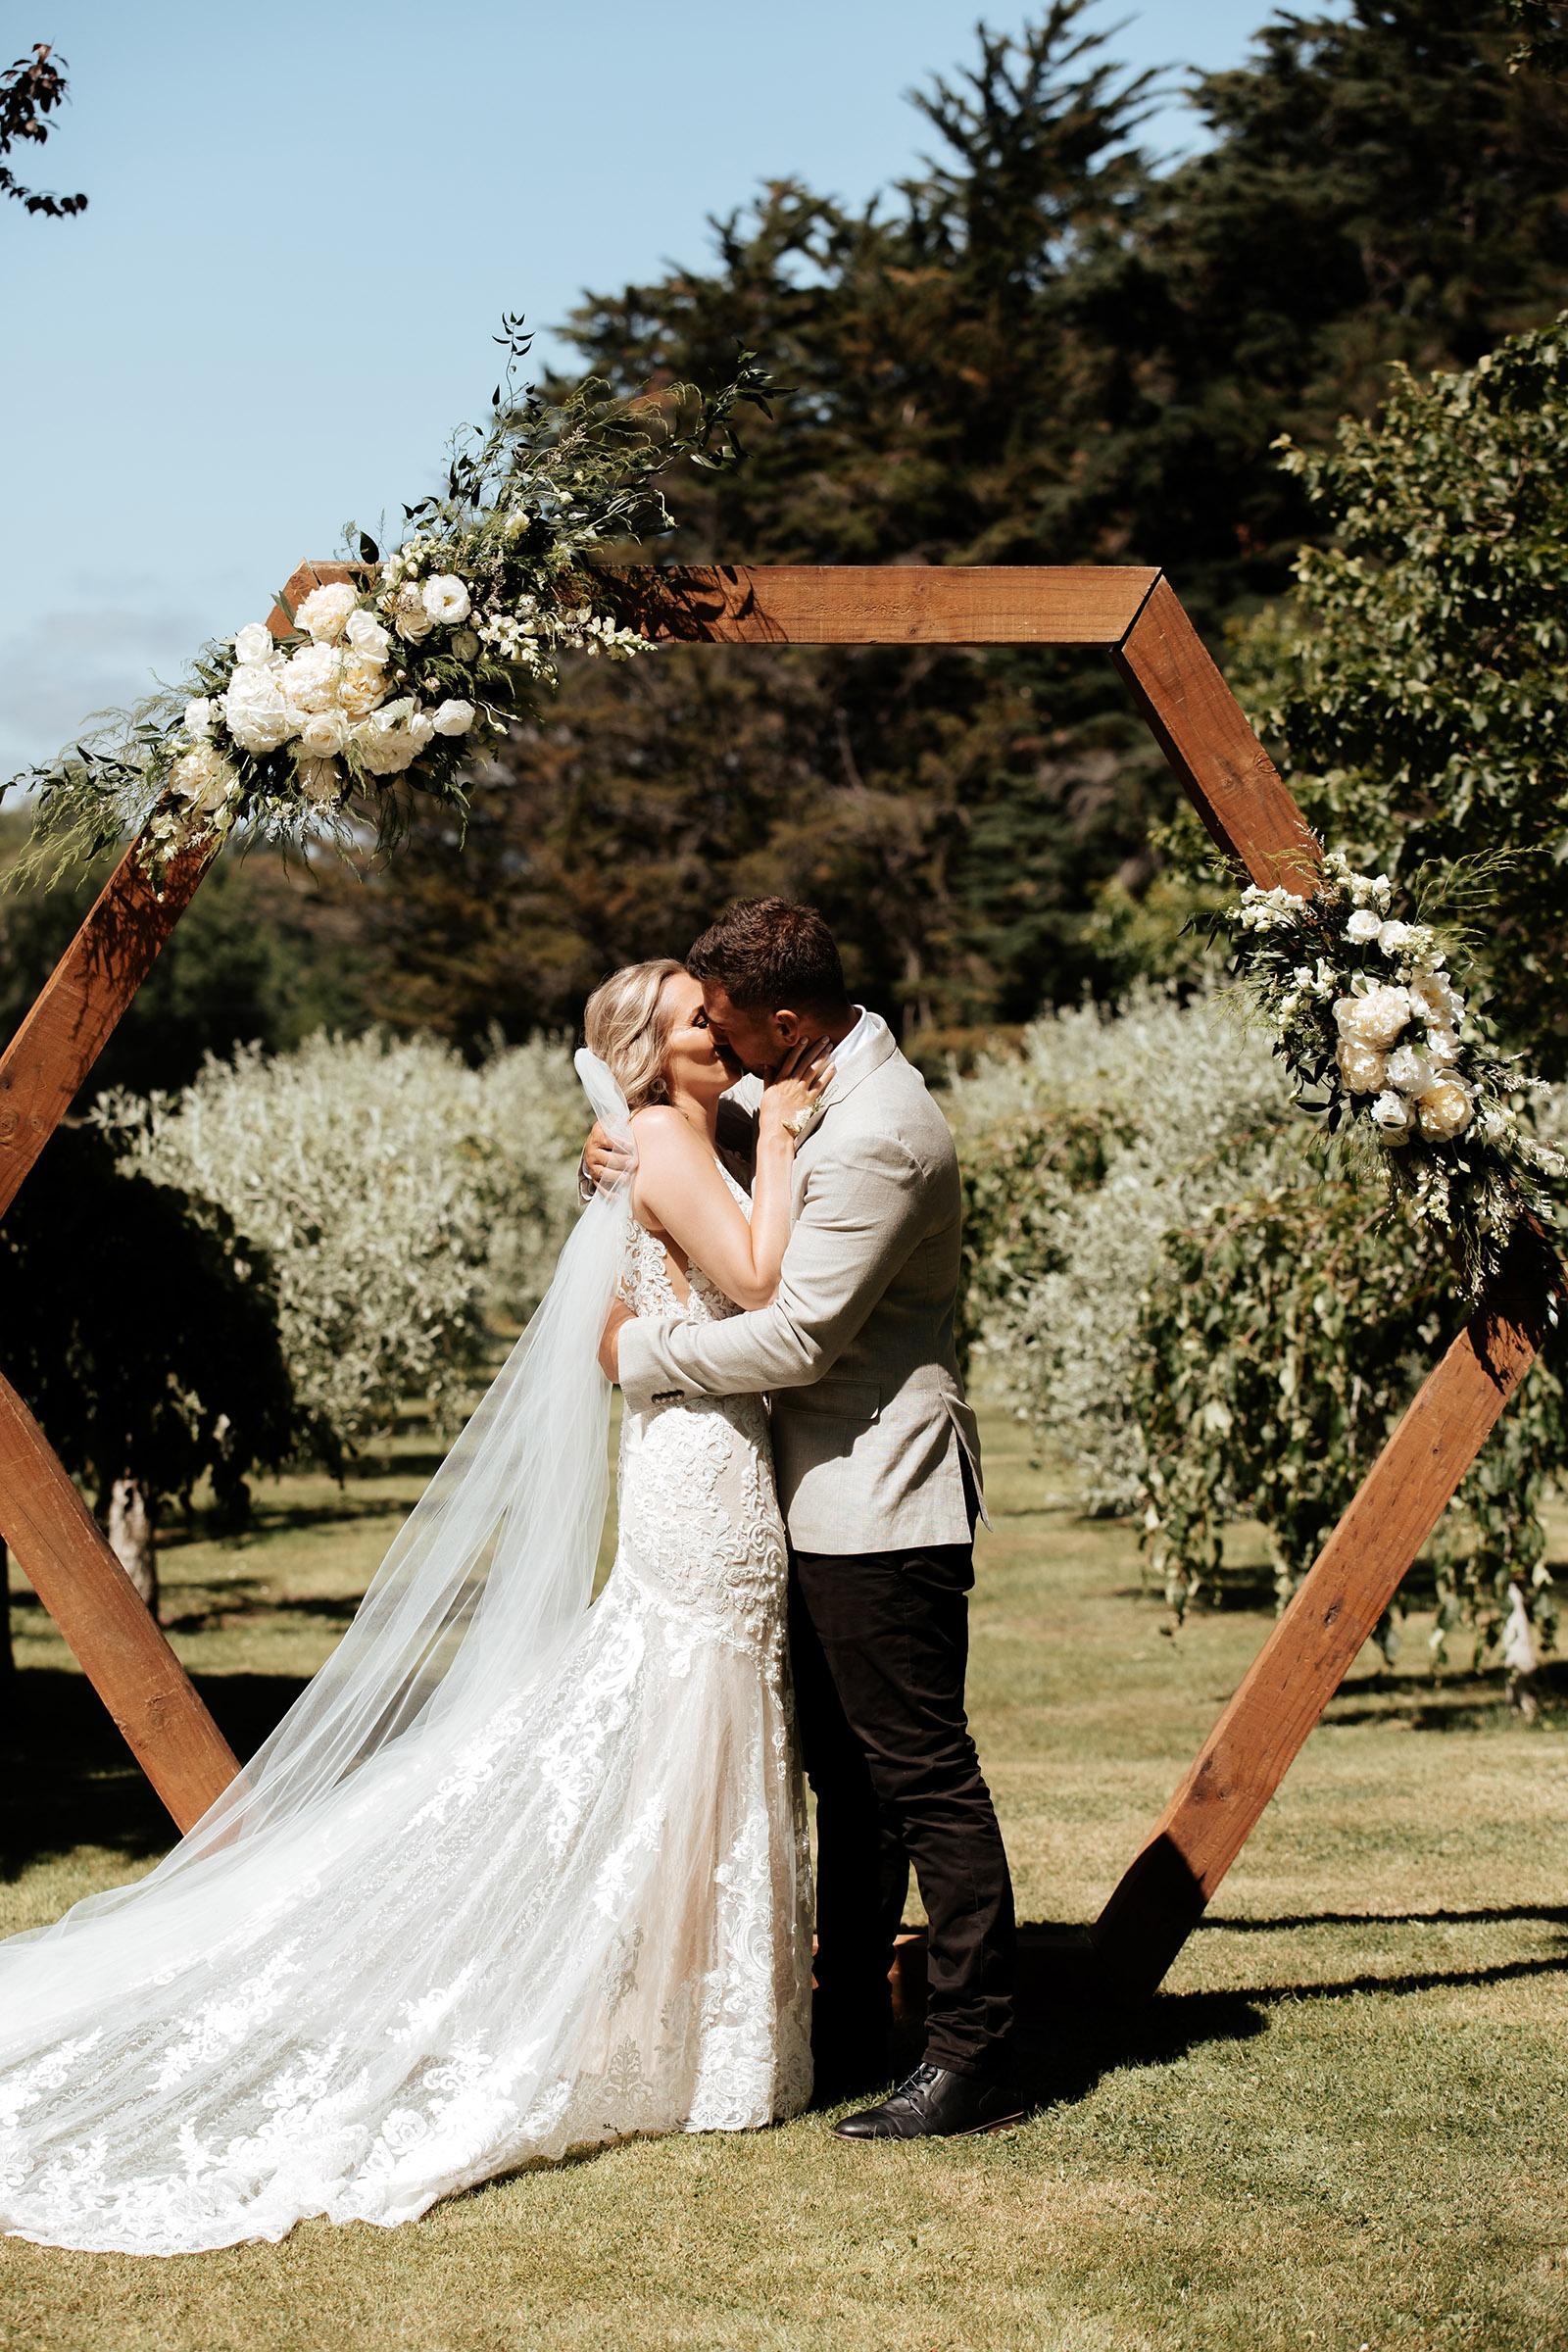 Alex and Kate wedding at Tipapa Estate